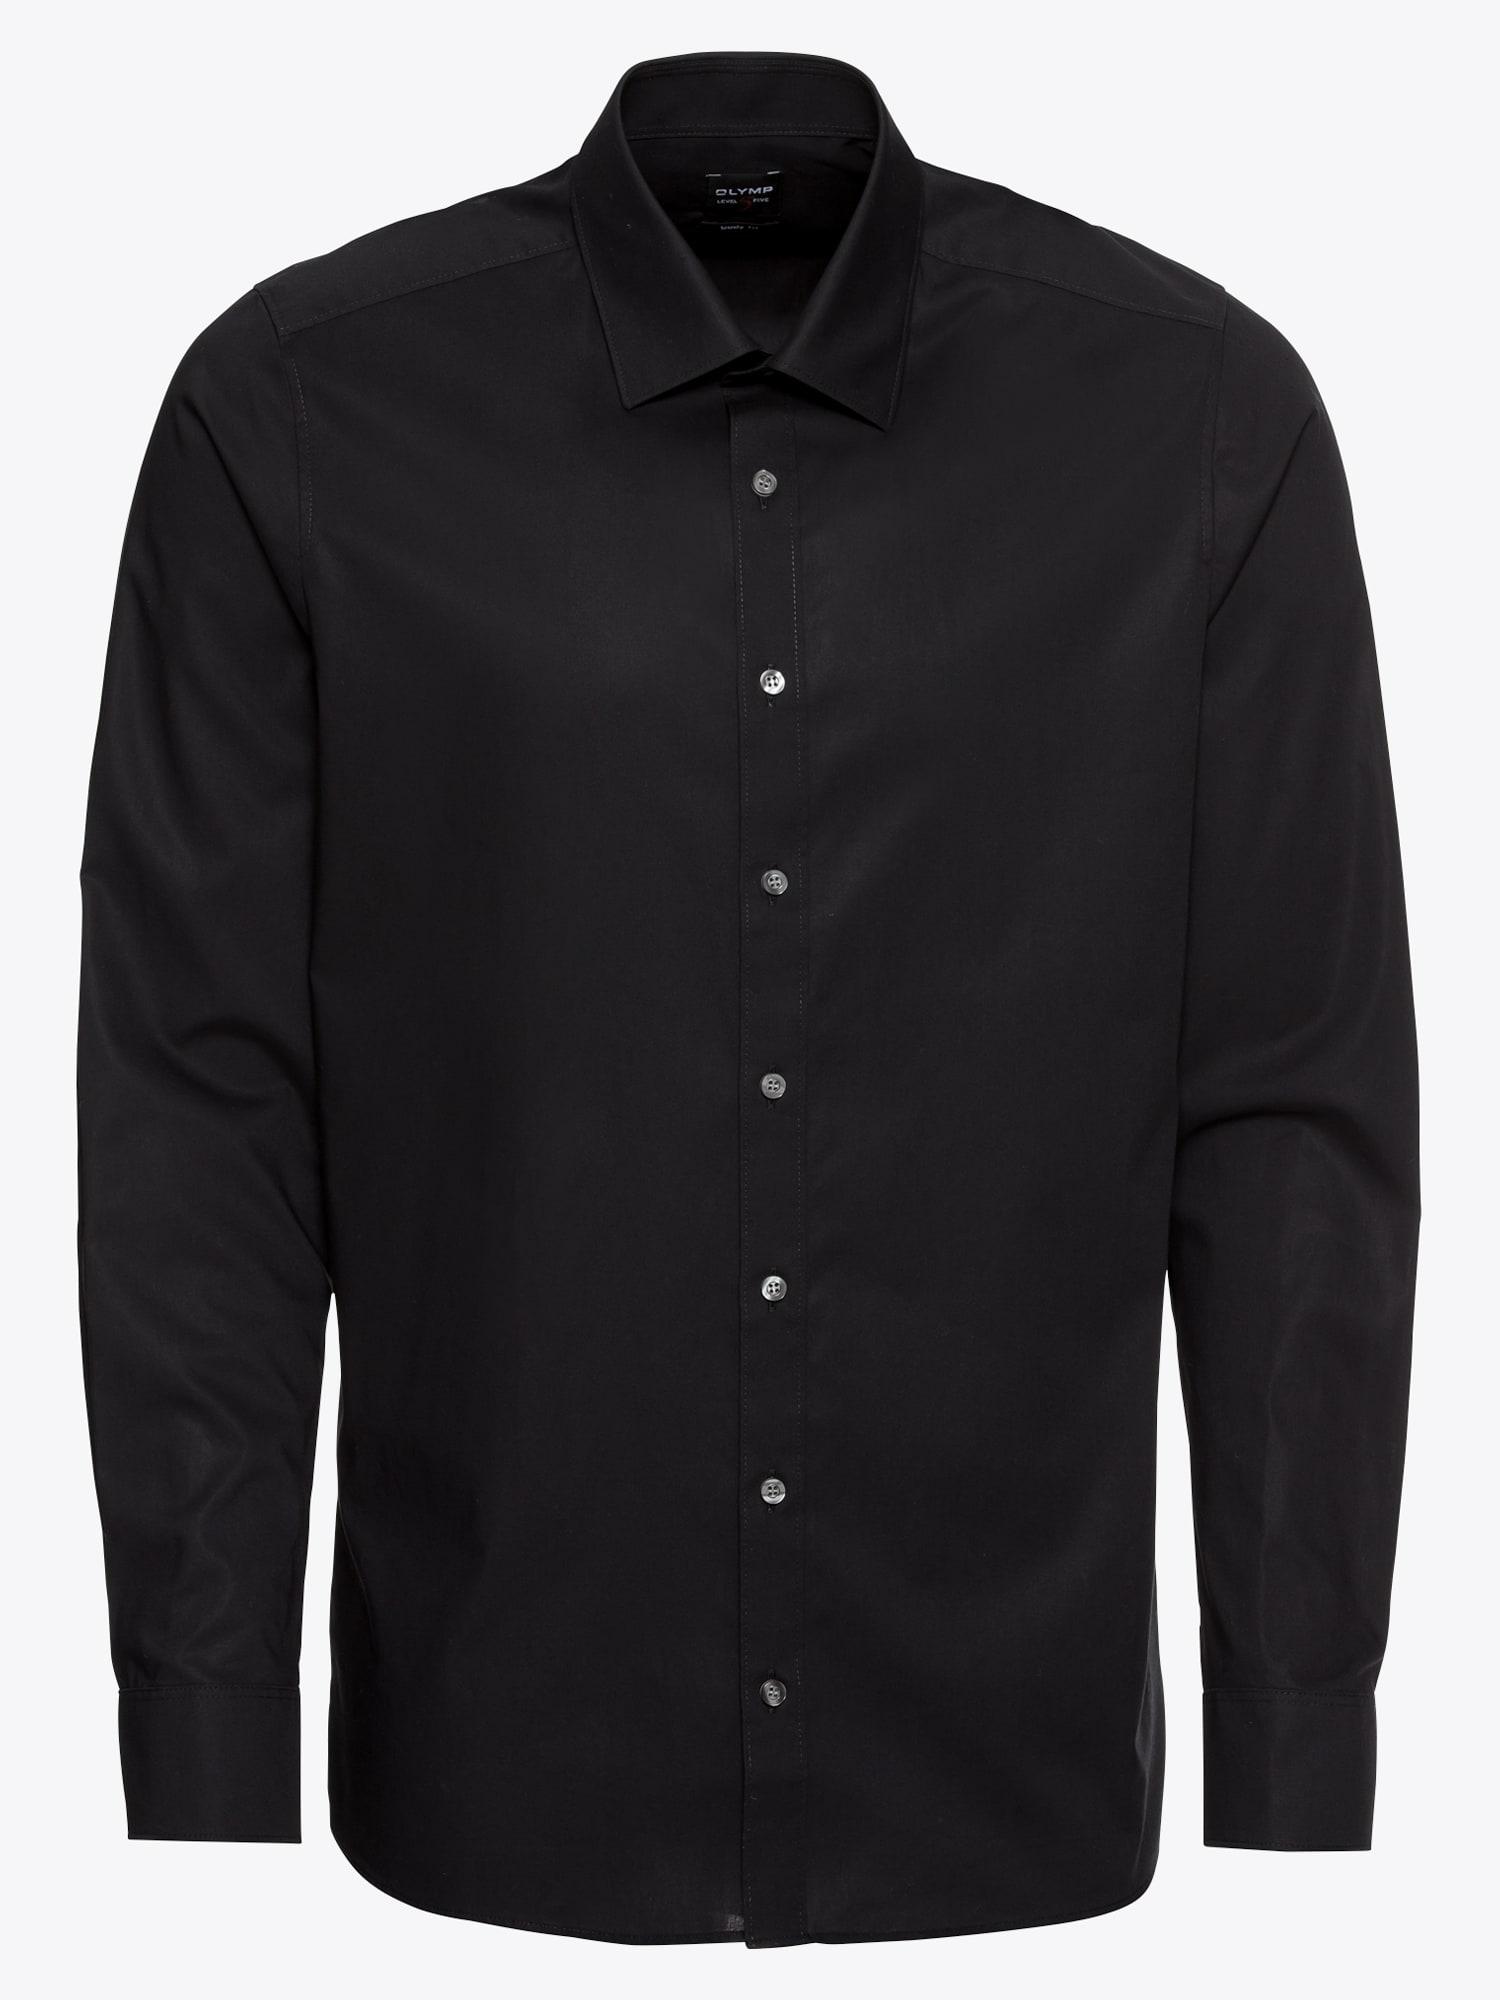 OLYMP, Heren Zakelijk overhemd 'Level 5 Uni Pop', zwart